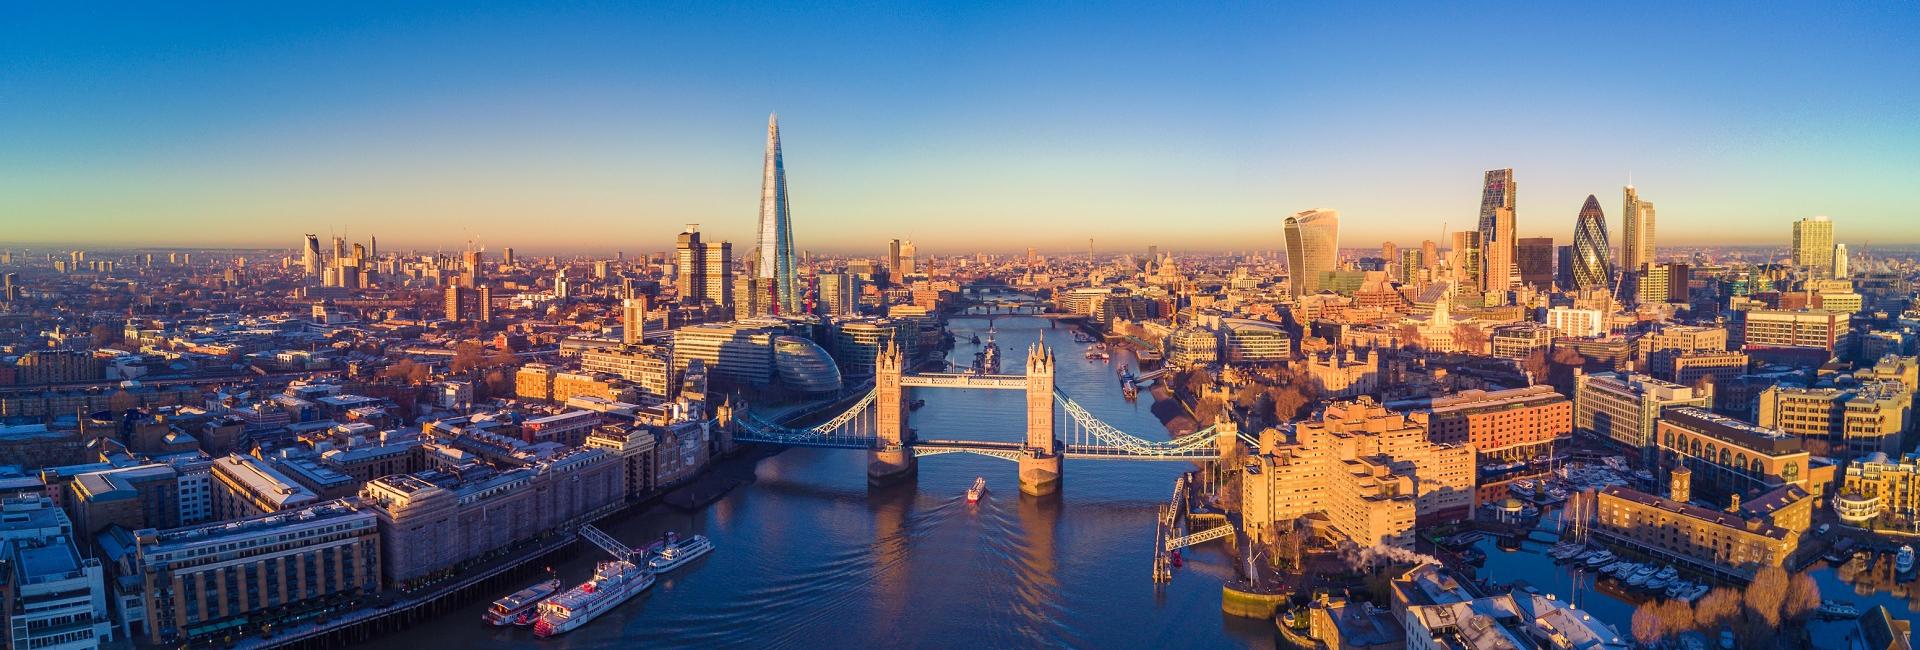 Banner-1920x650-London-Skyline - Agency Express